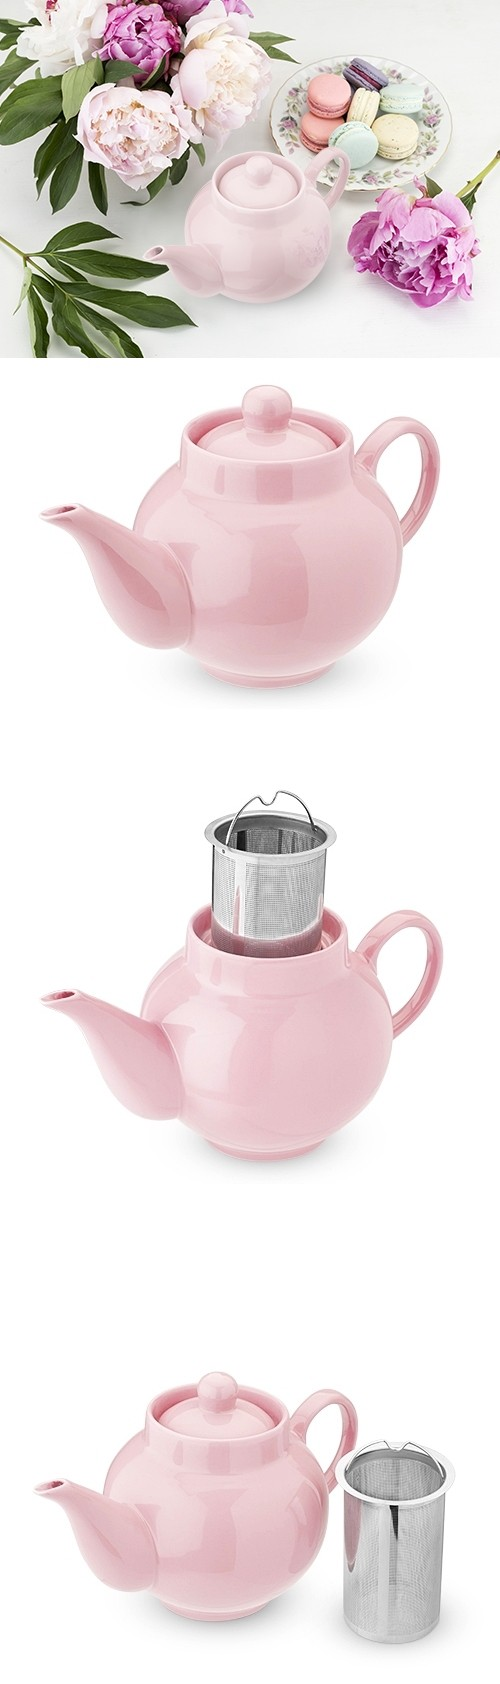 Regan™ Light Pink Ceramic Teapot & Infuser by Pinky Up®